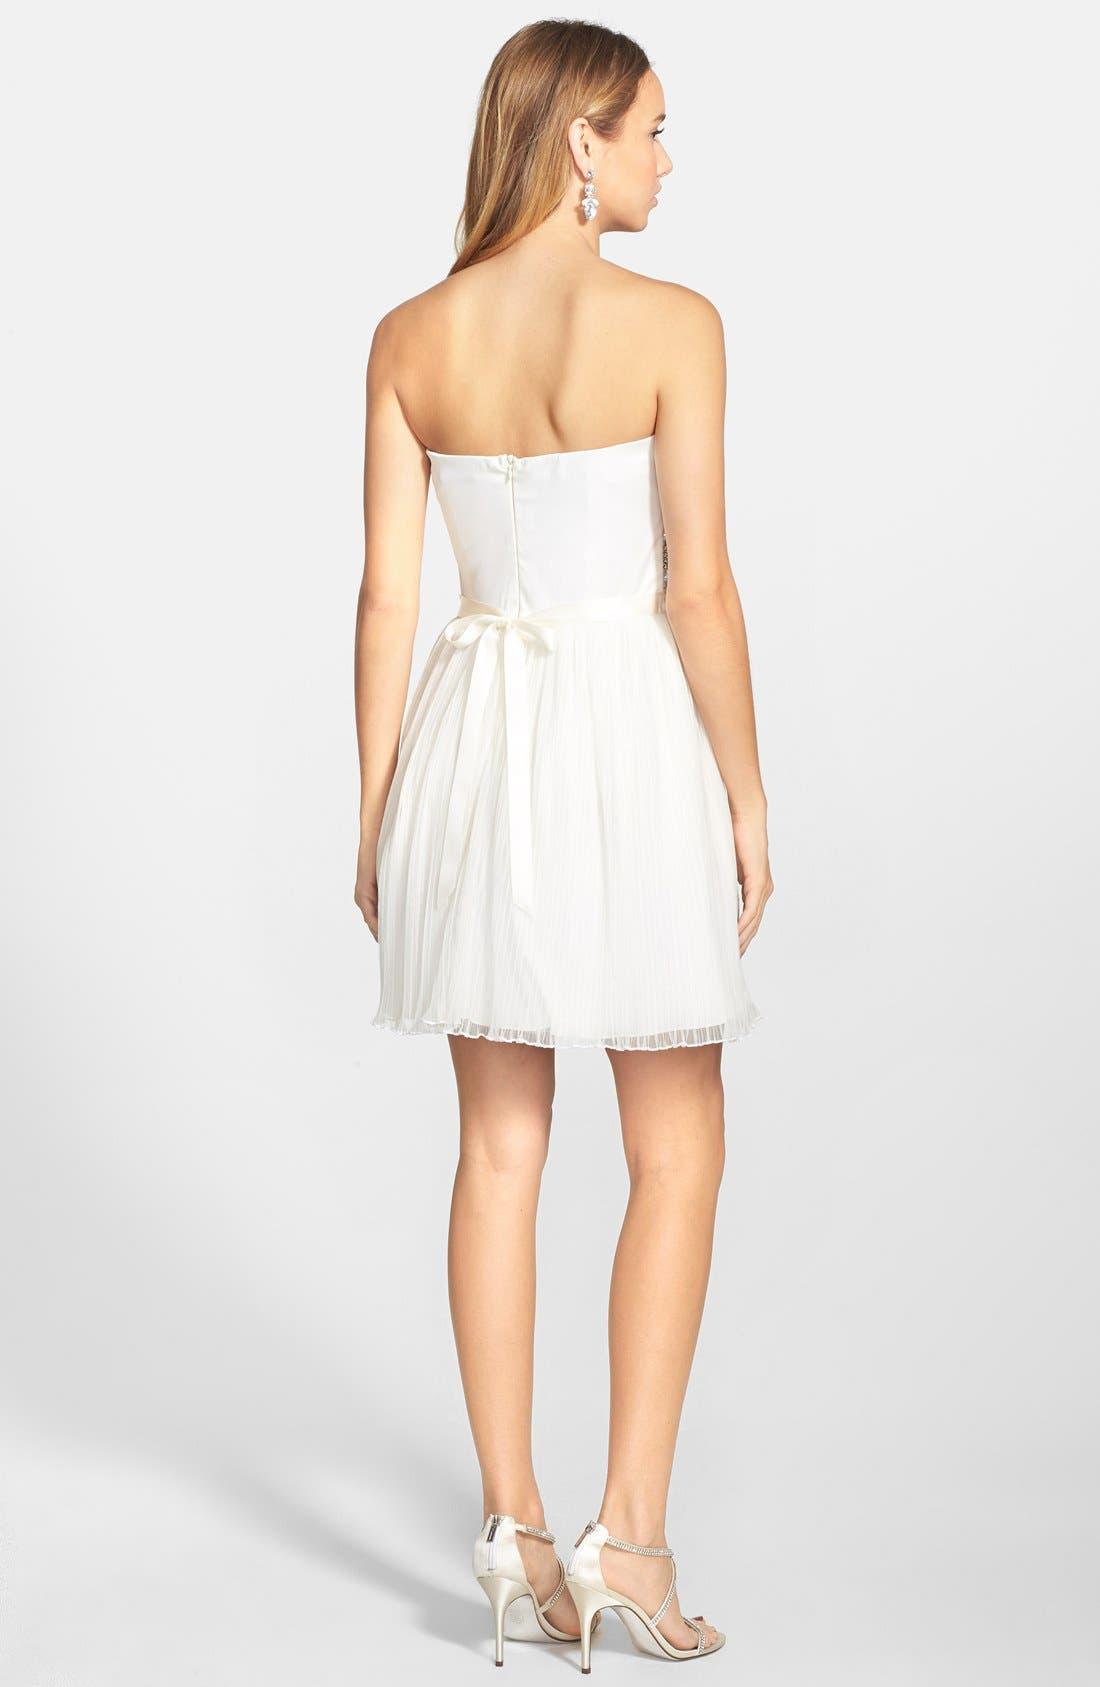 AS U WISH, Strapless Gem Bodice Dress, Alternate thumbnail 3, color, 100